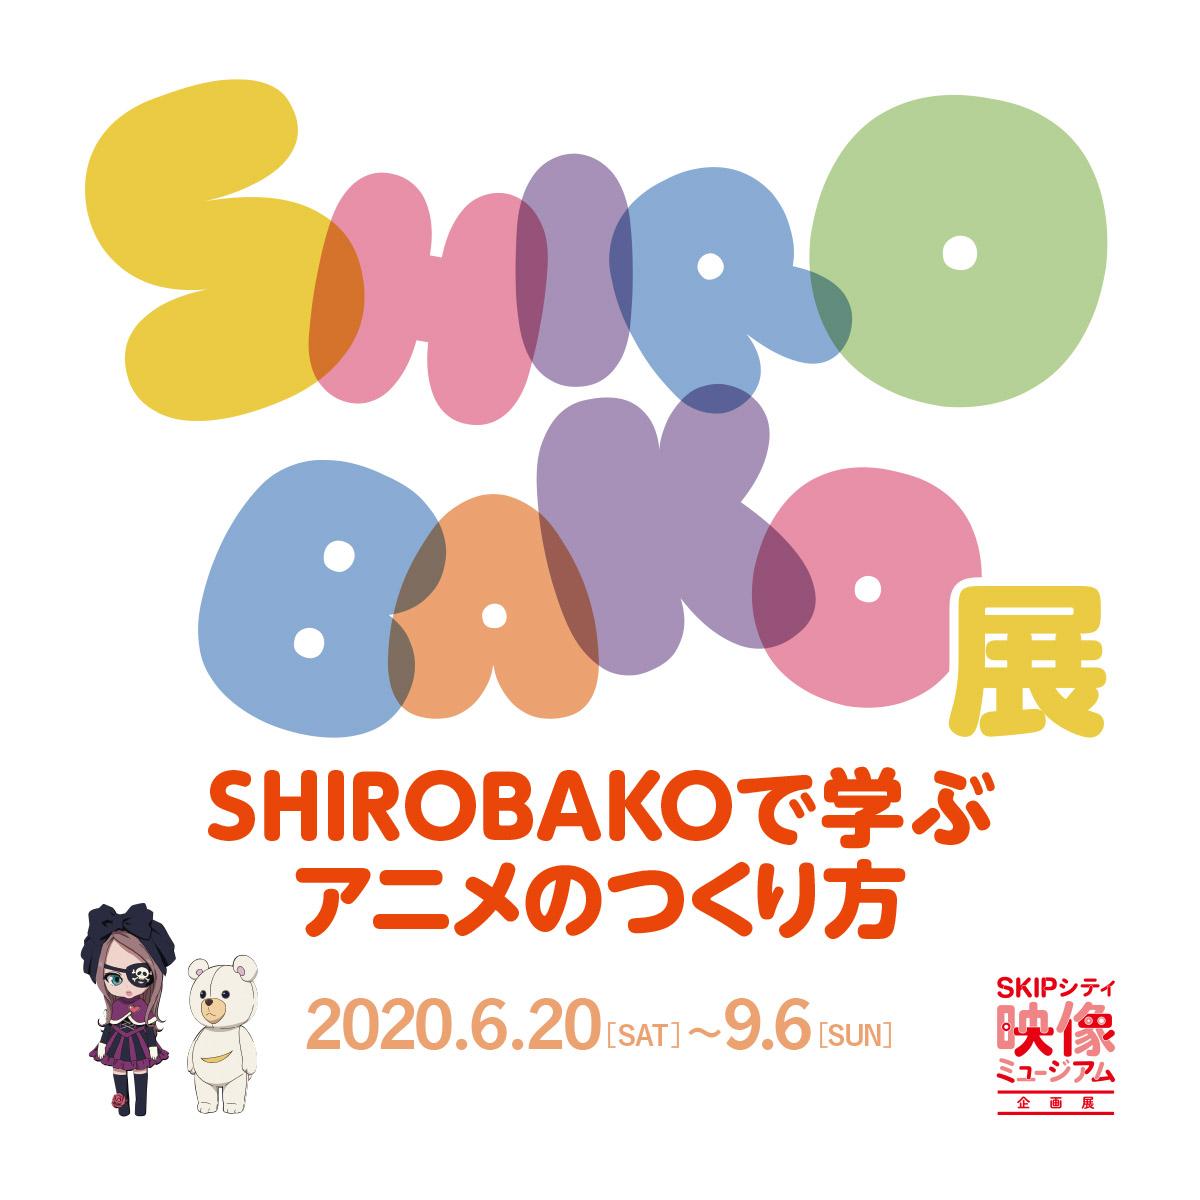 SKIPシティで「SHIROBAKO」の展覧会を開催